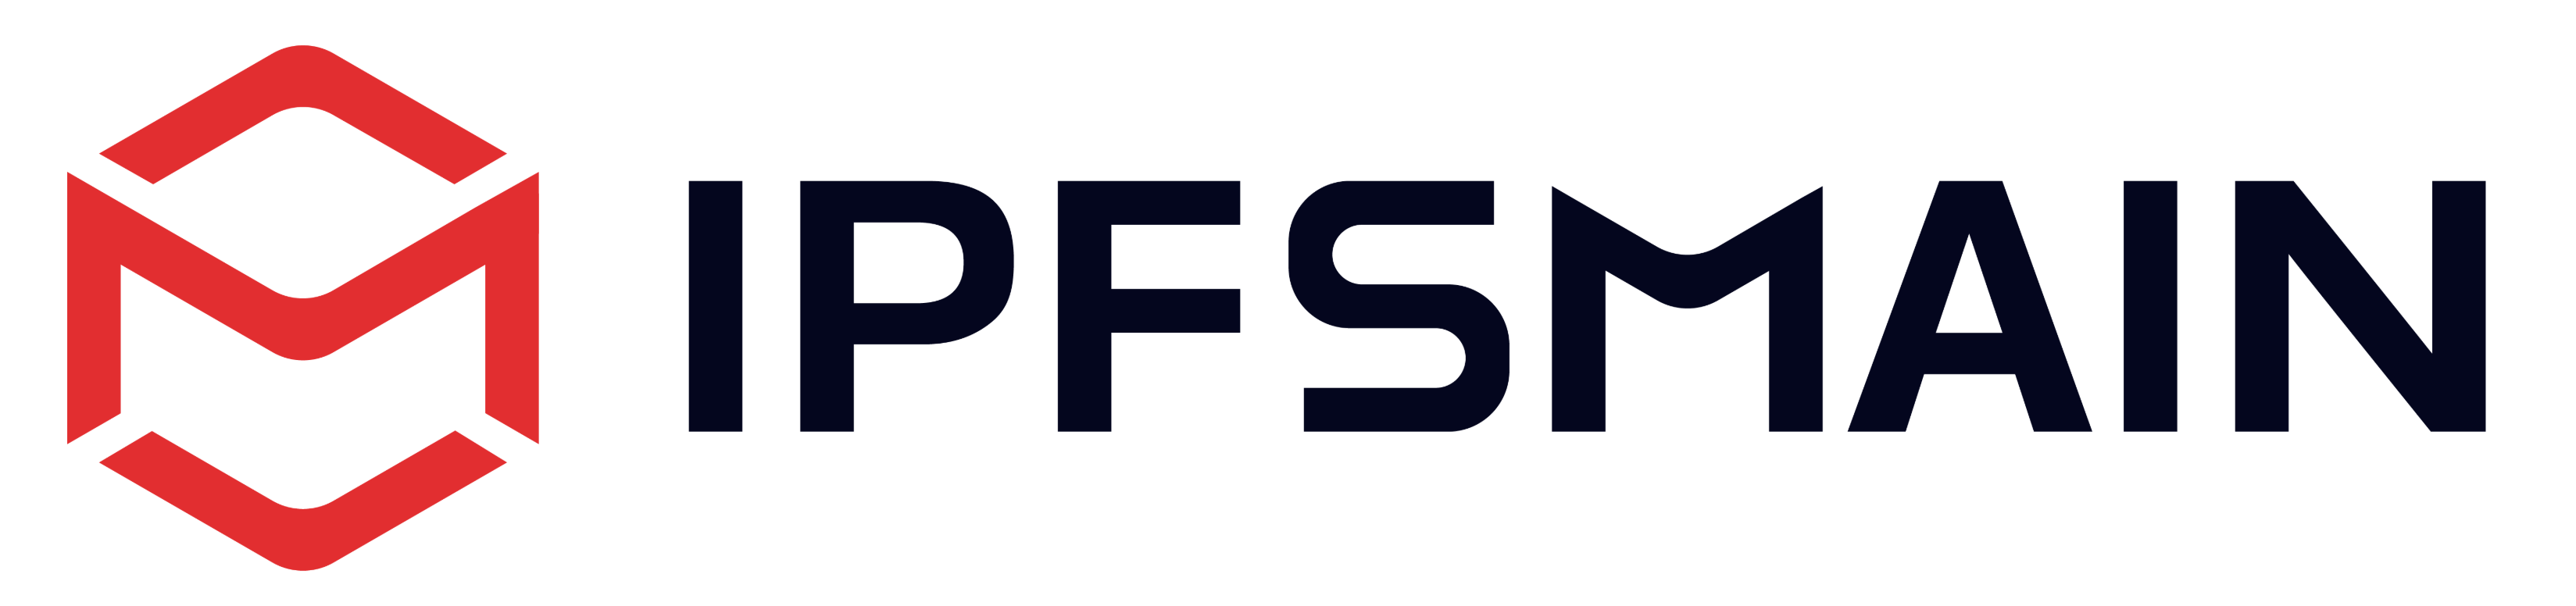 IPFSMain